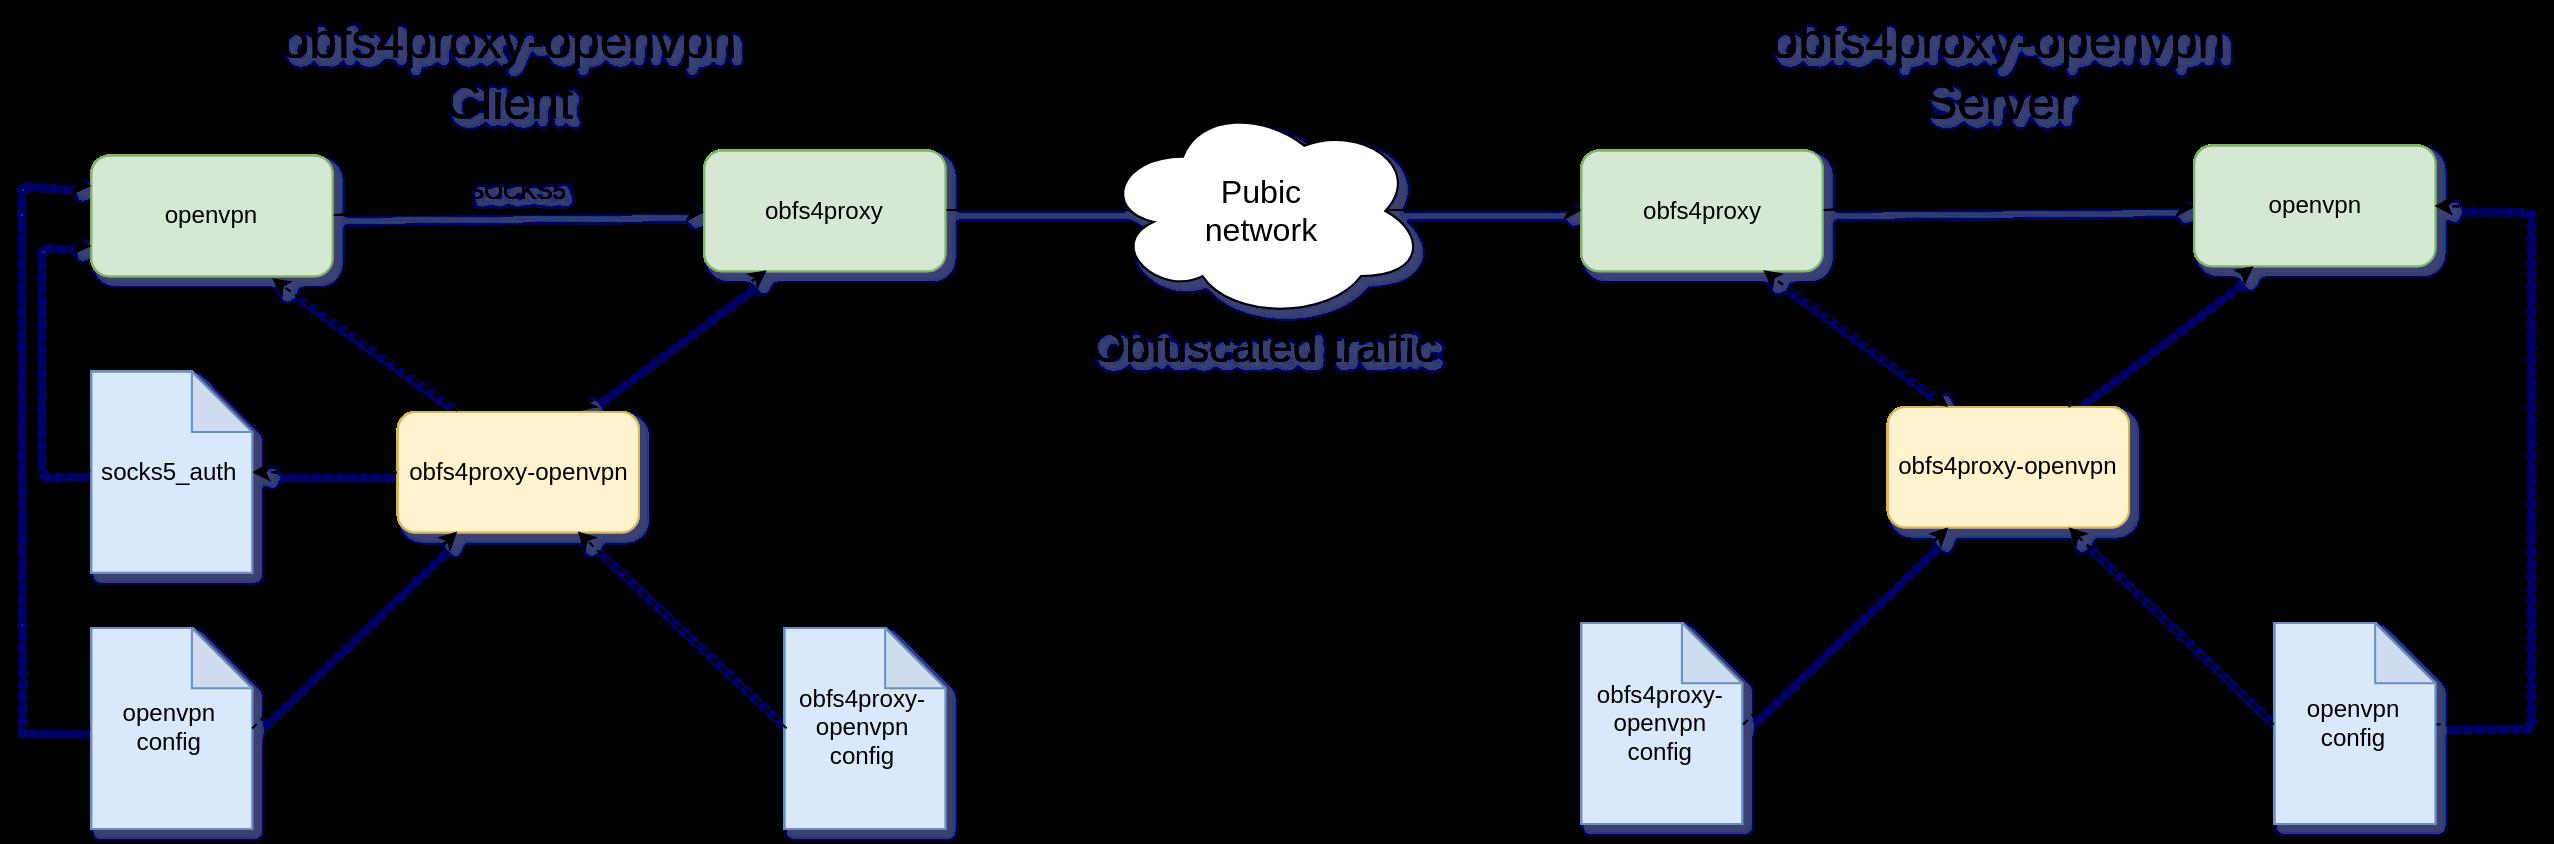 obfs4proxy-openvpn diagram